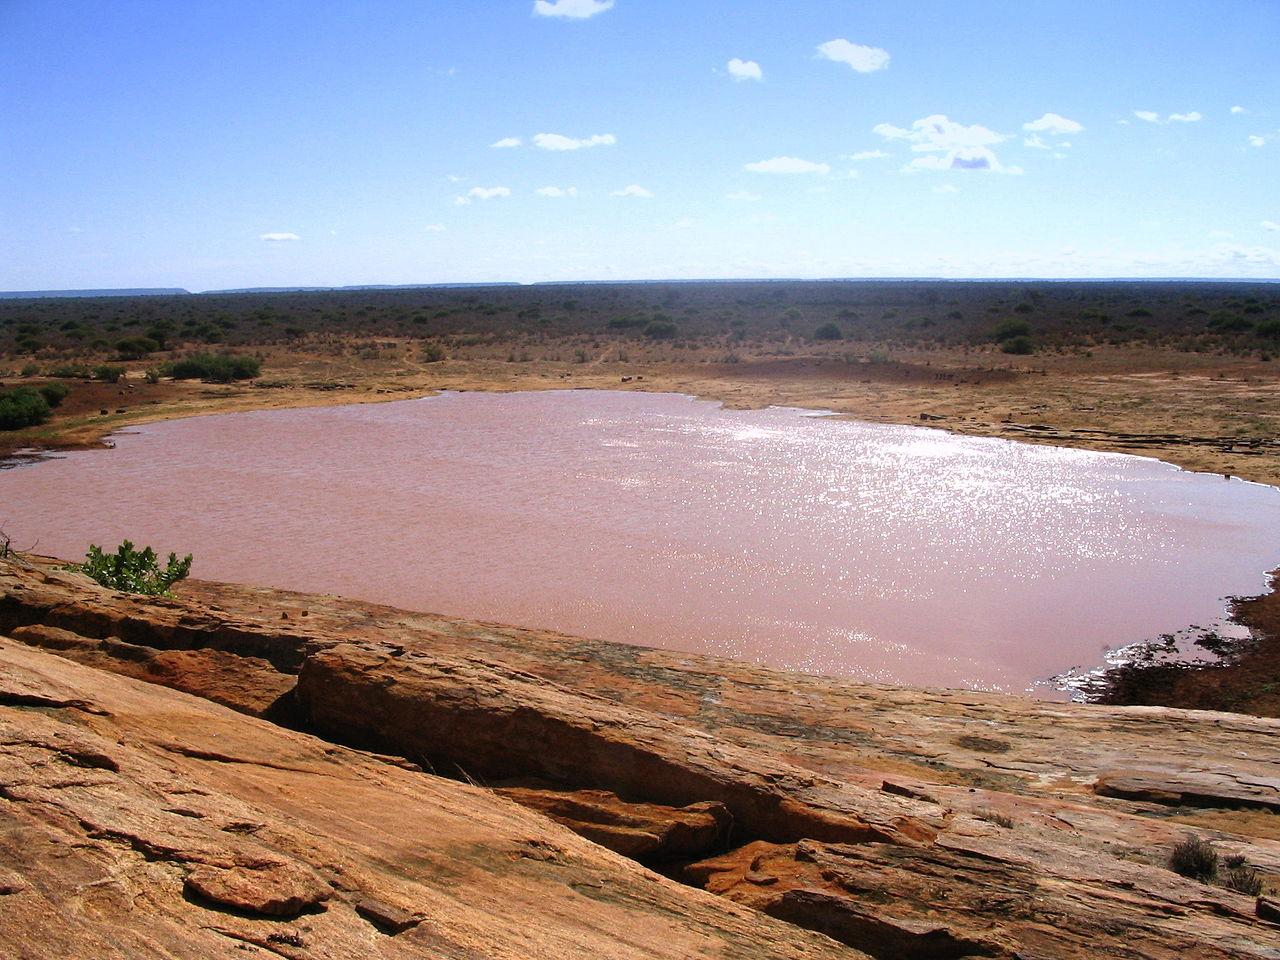 1280px-Mudanda_Rock_in_Tsavo_East_National_Park_(edited)